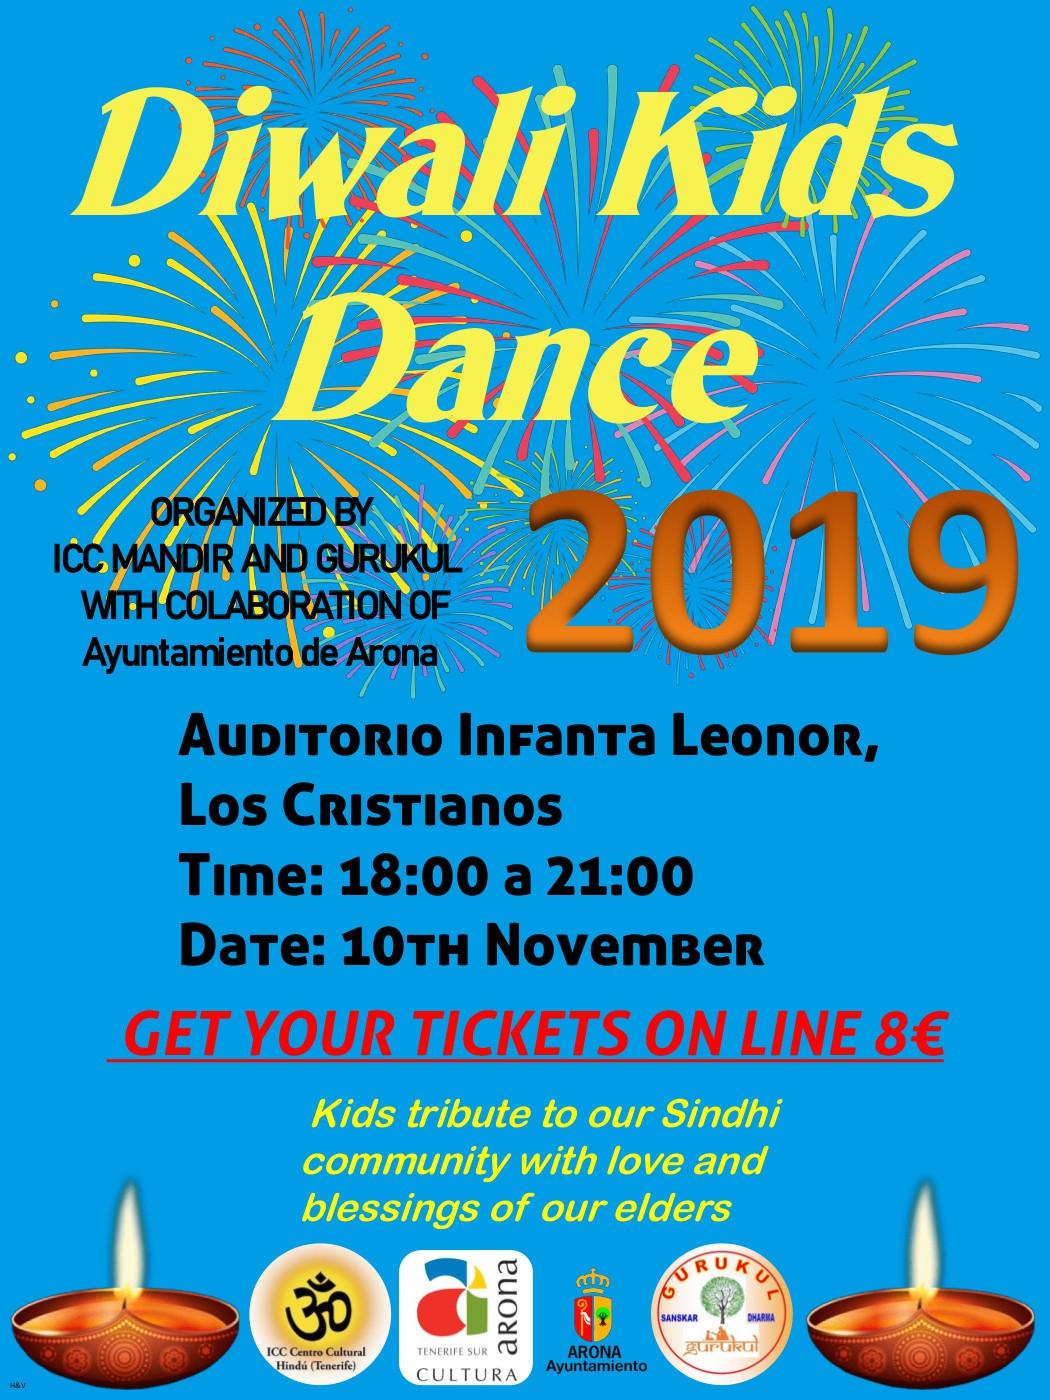 Diwali Kids Dance